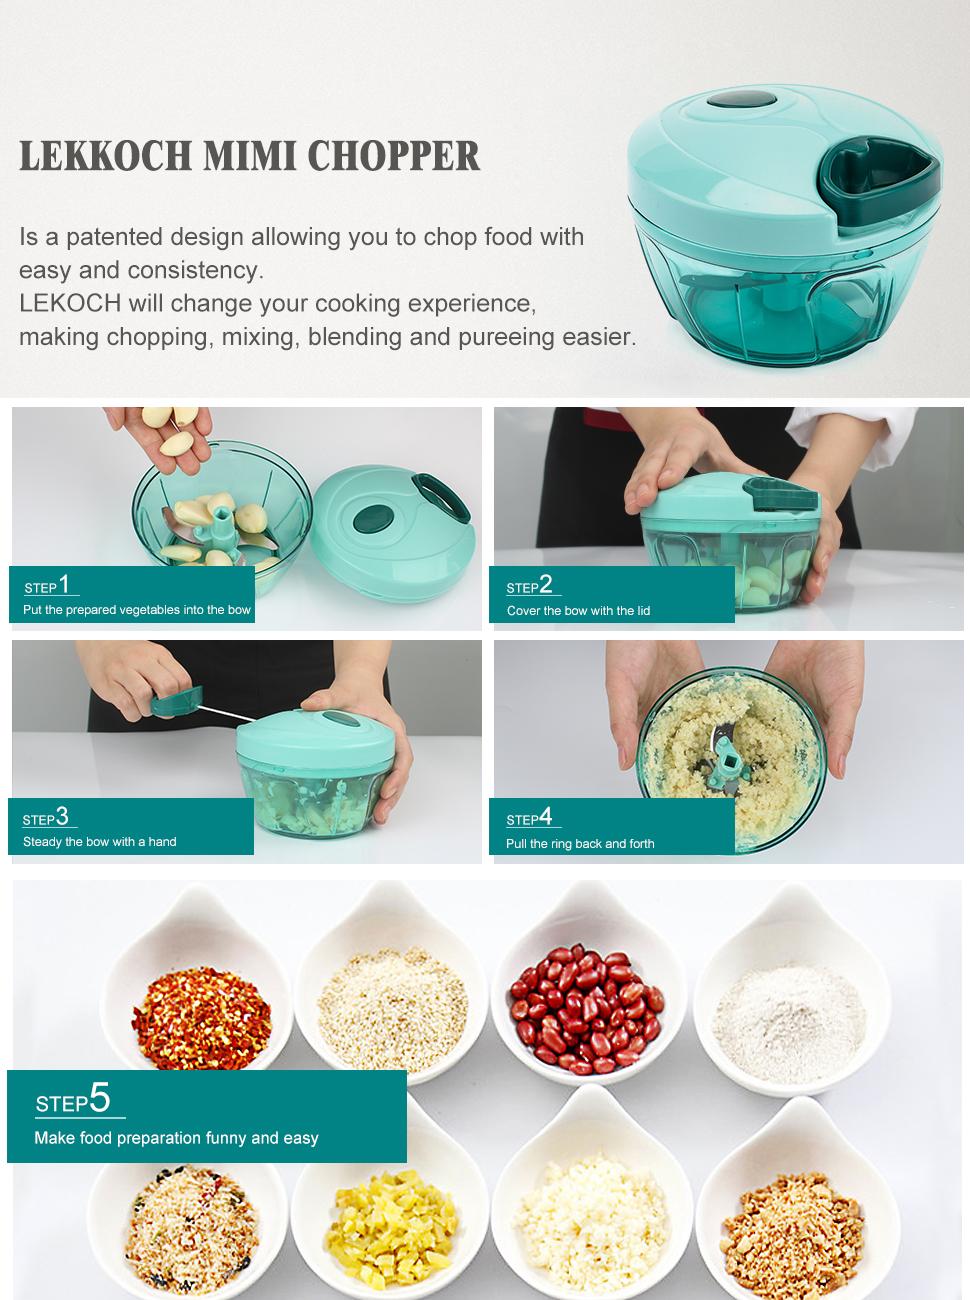 Amazon.com: LEKOCH Essential Kitchen Tools Onion Chopper Hand Speedy ...